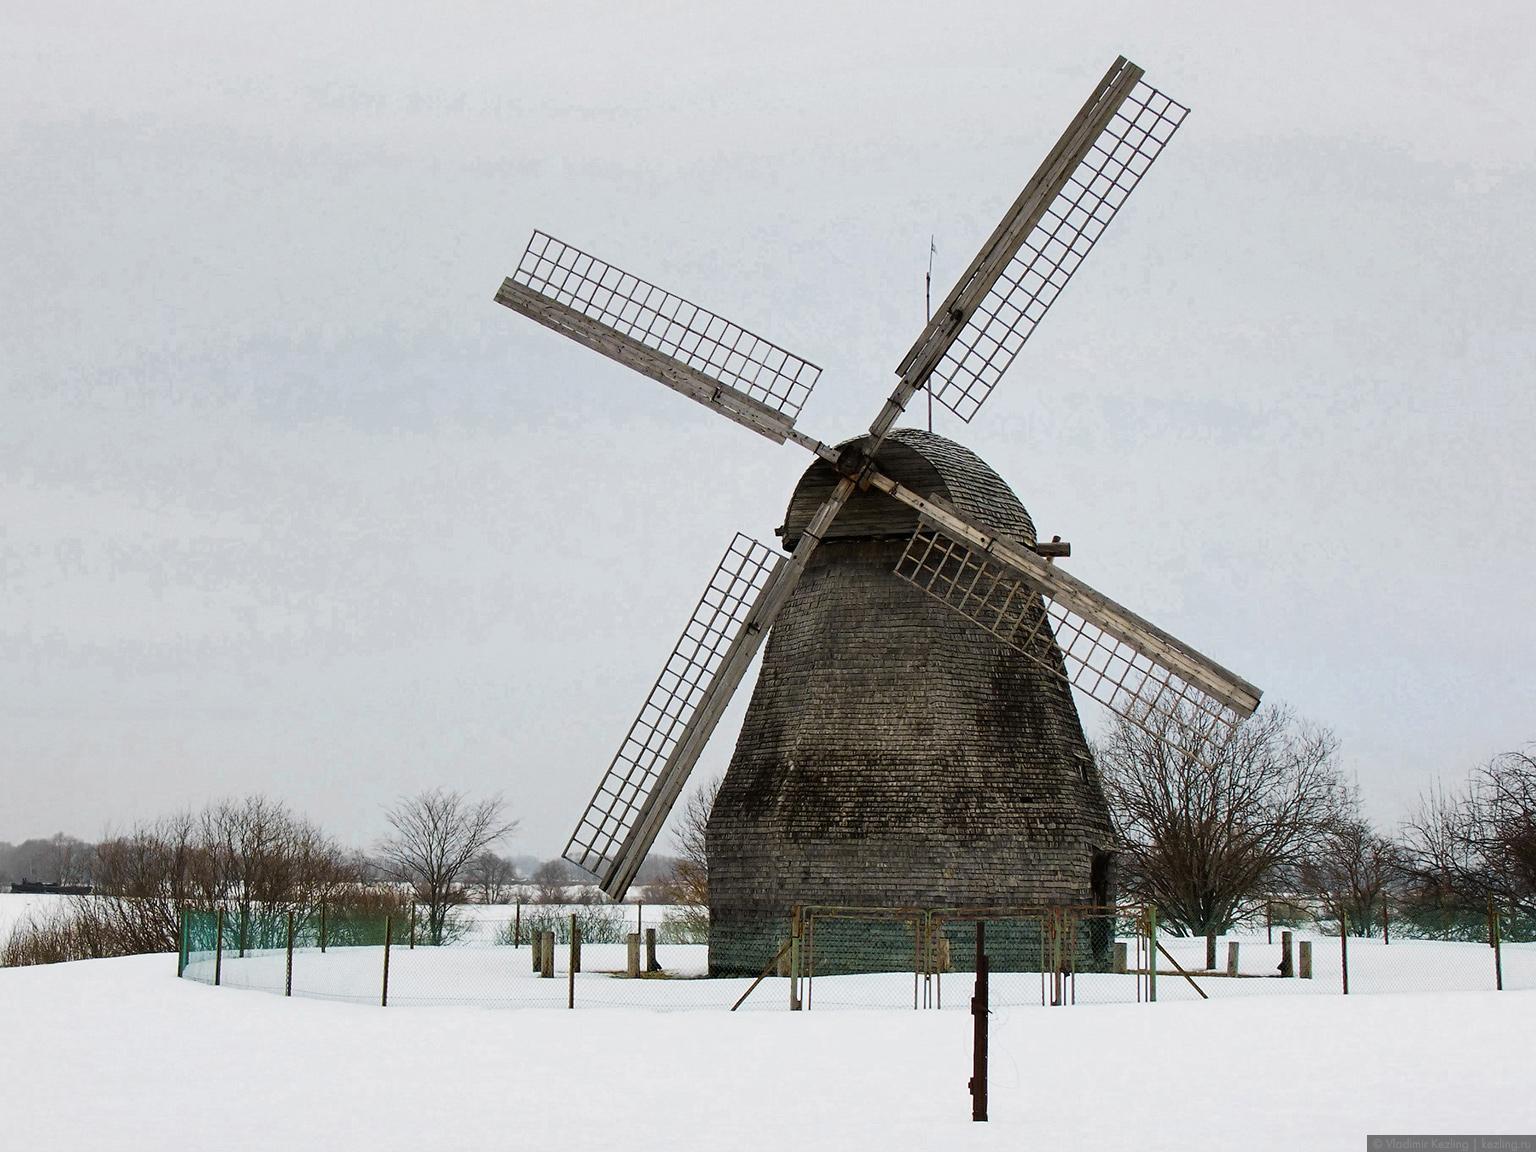 Зимний Новгород. Окрестности